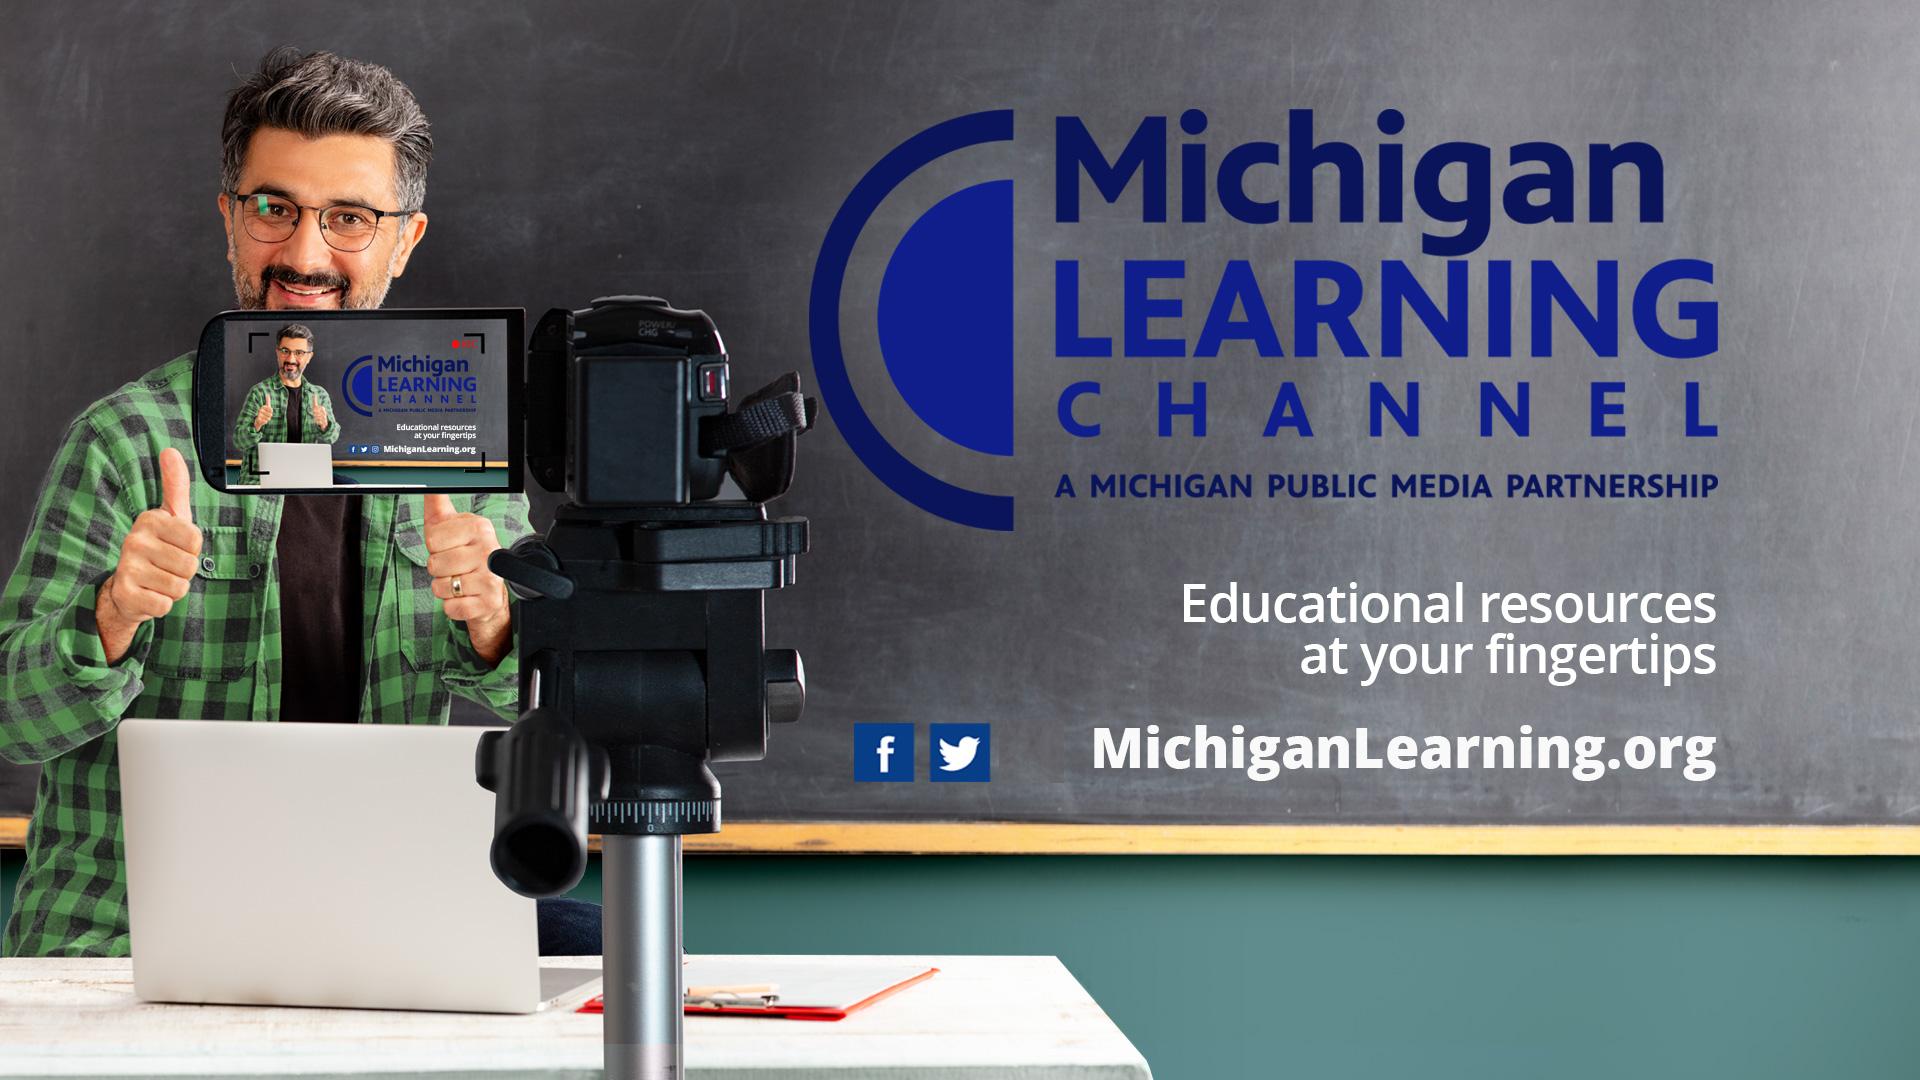 Michigan Learning Channel - A Michigan public media partnership